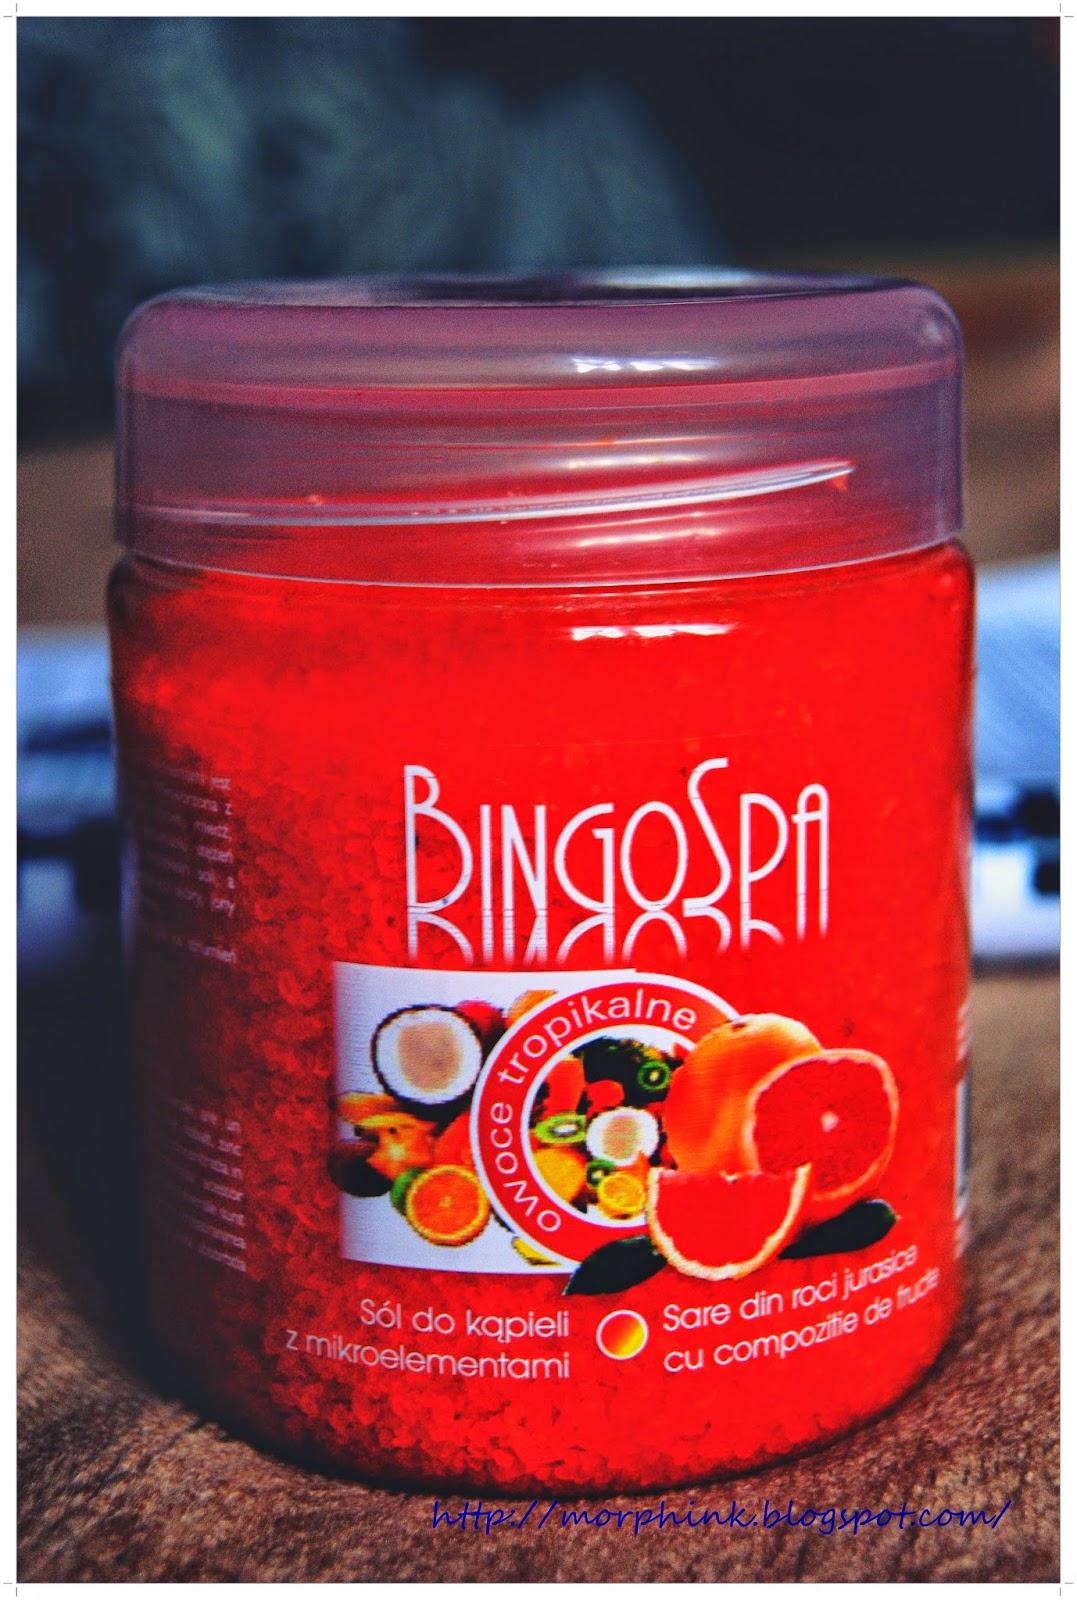 Sól do kąpieli BingoSpa